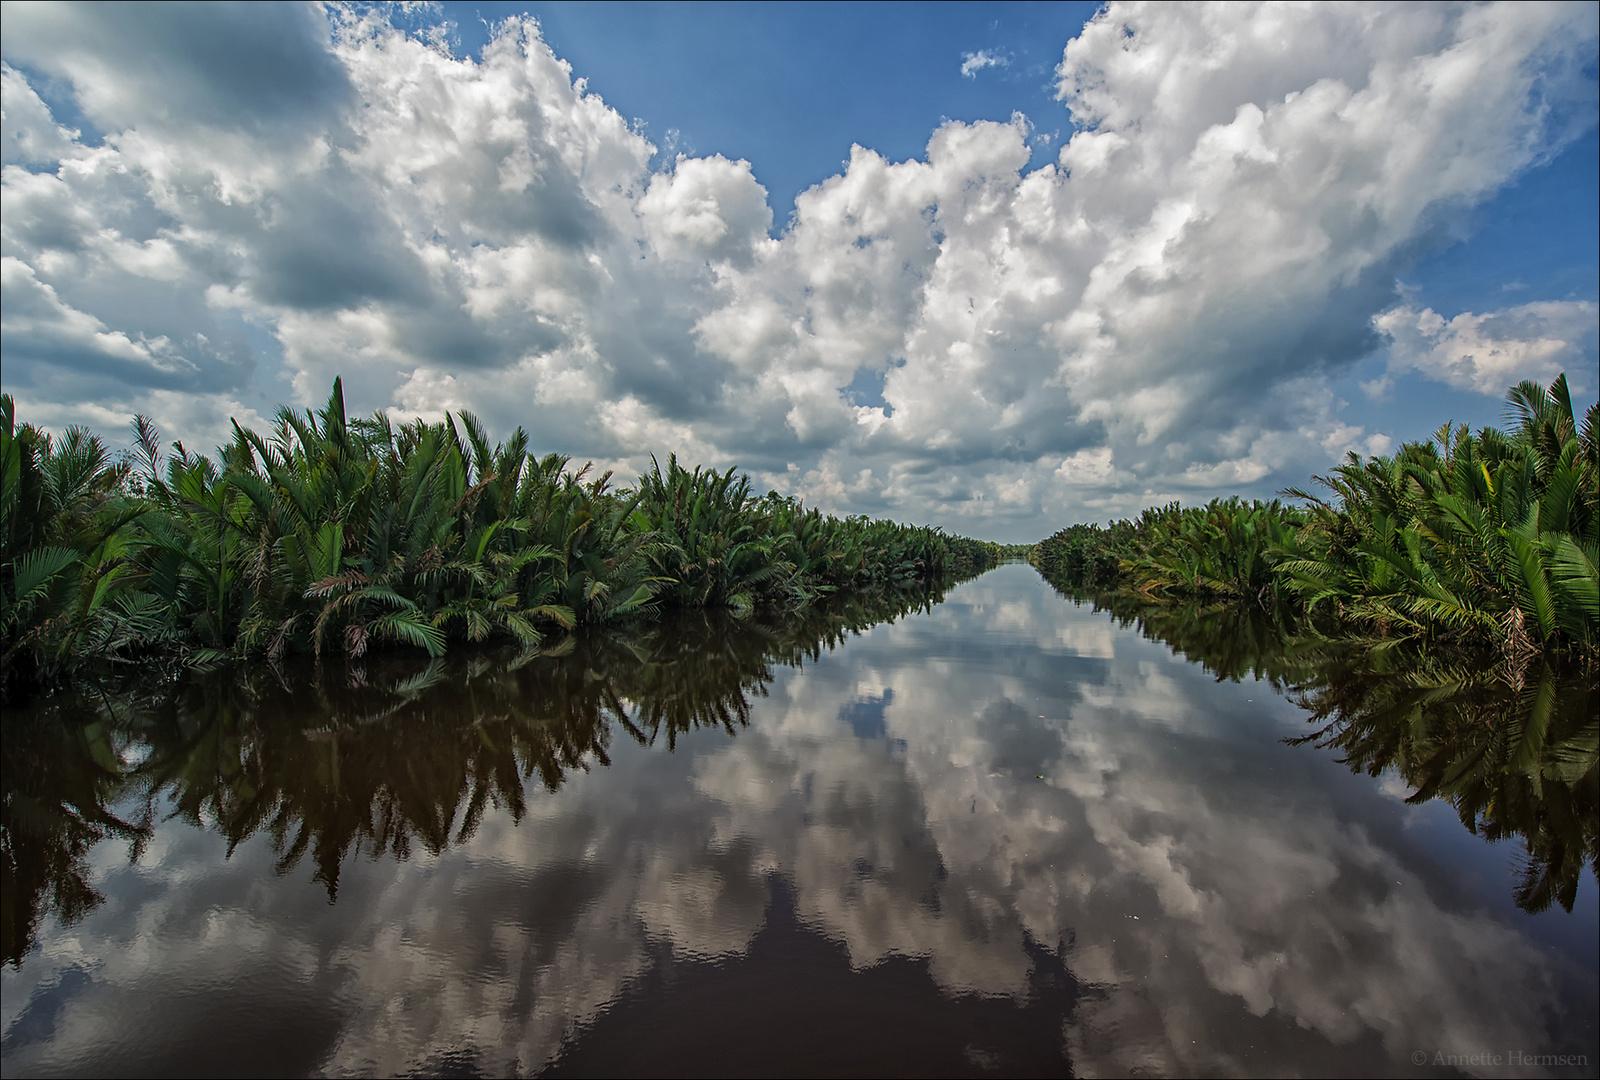 Indonesien [15] - Reflection